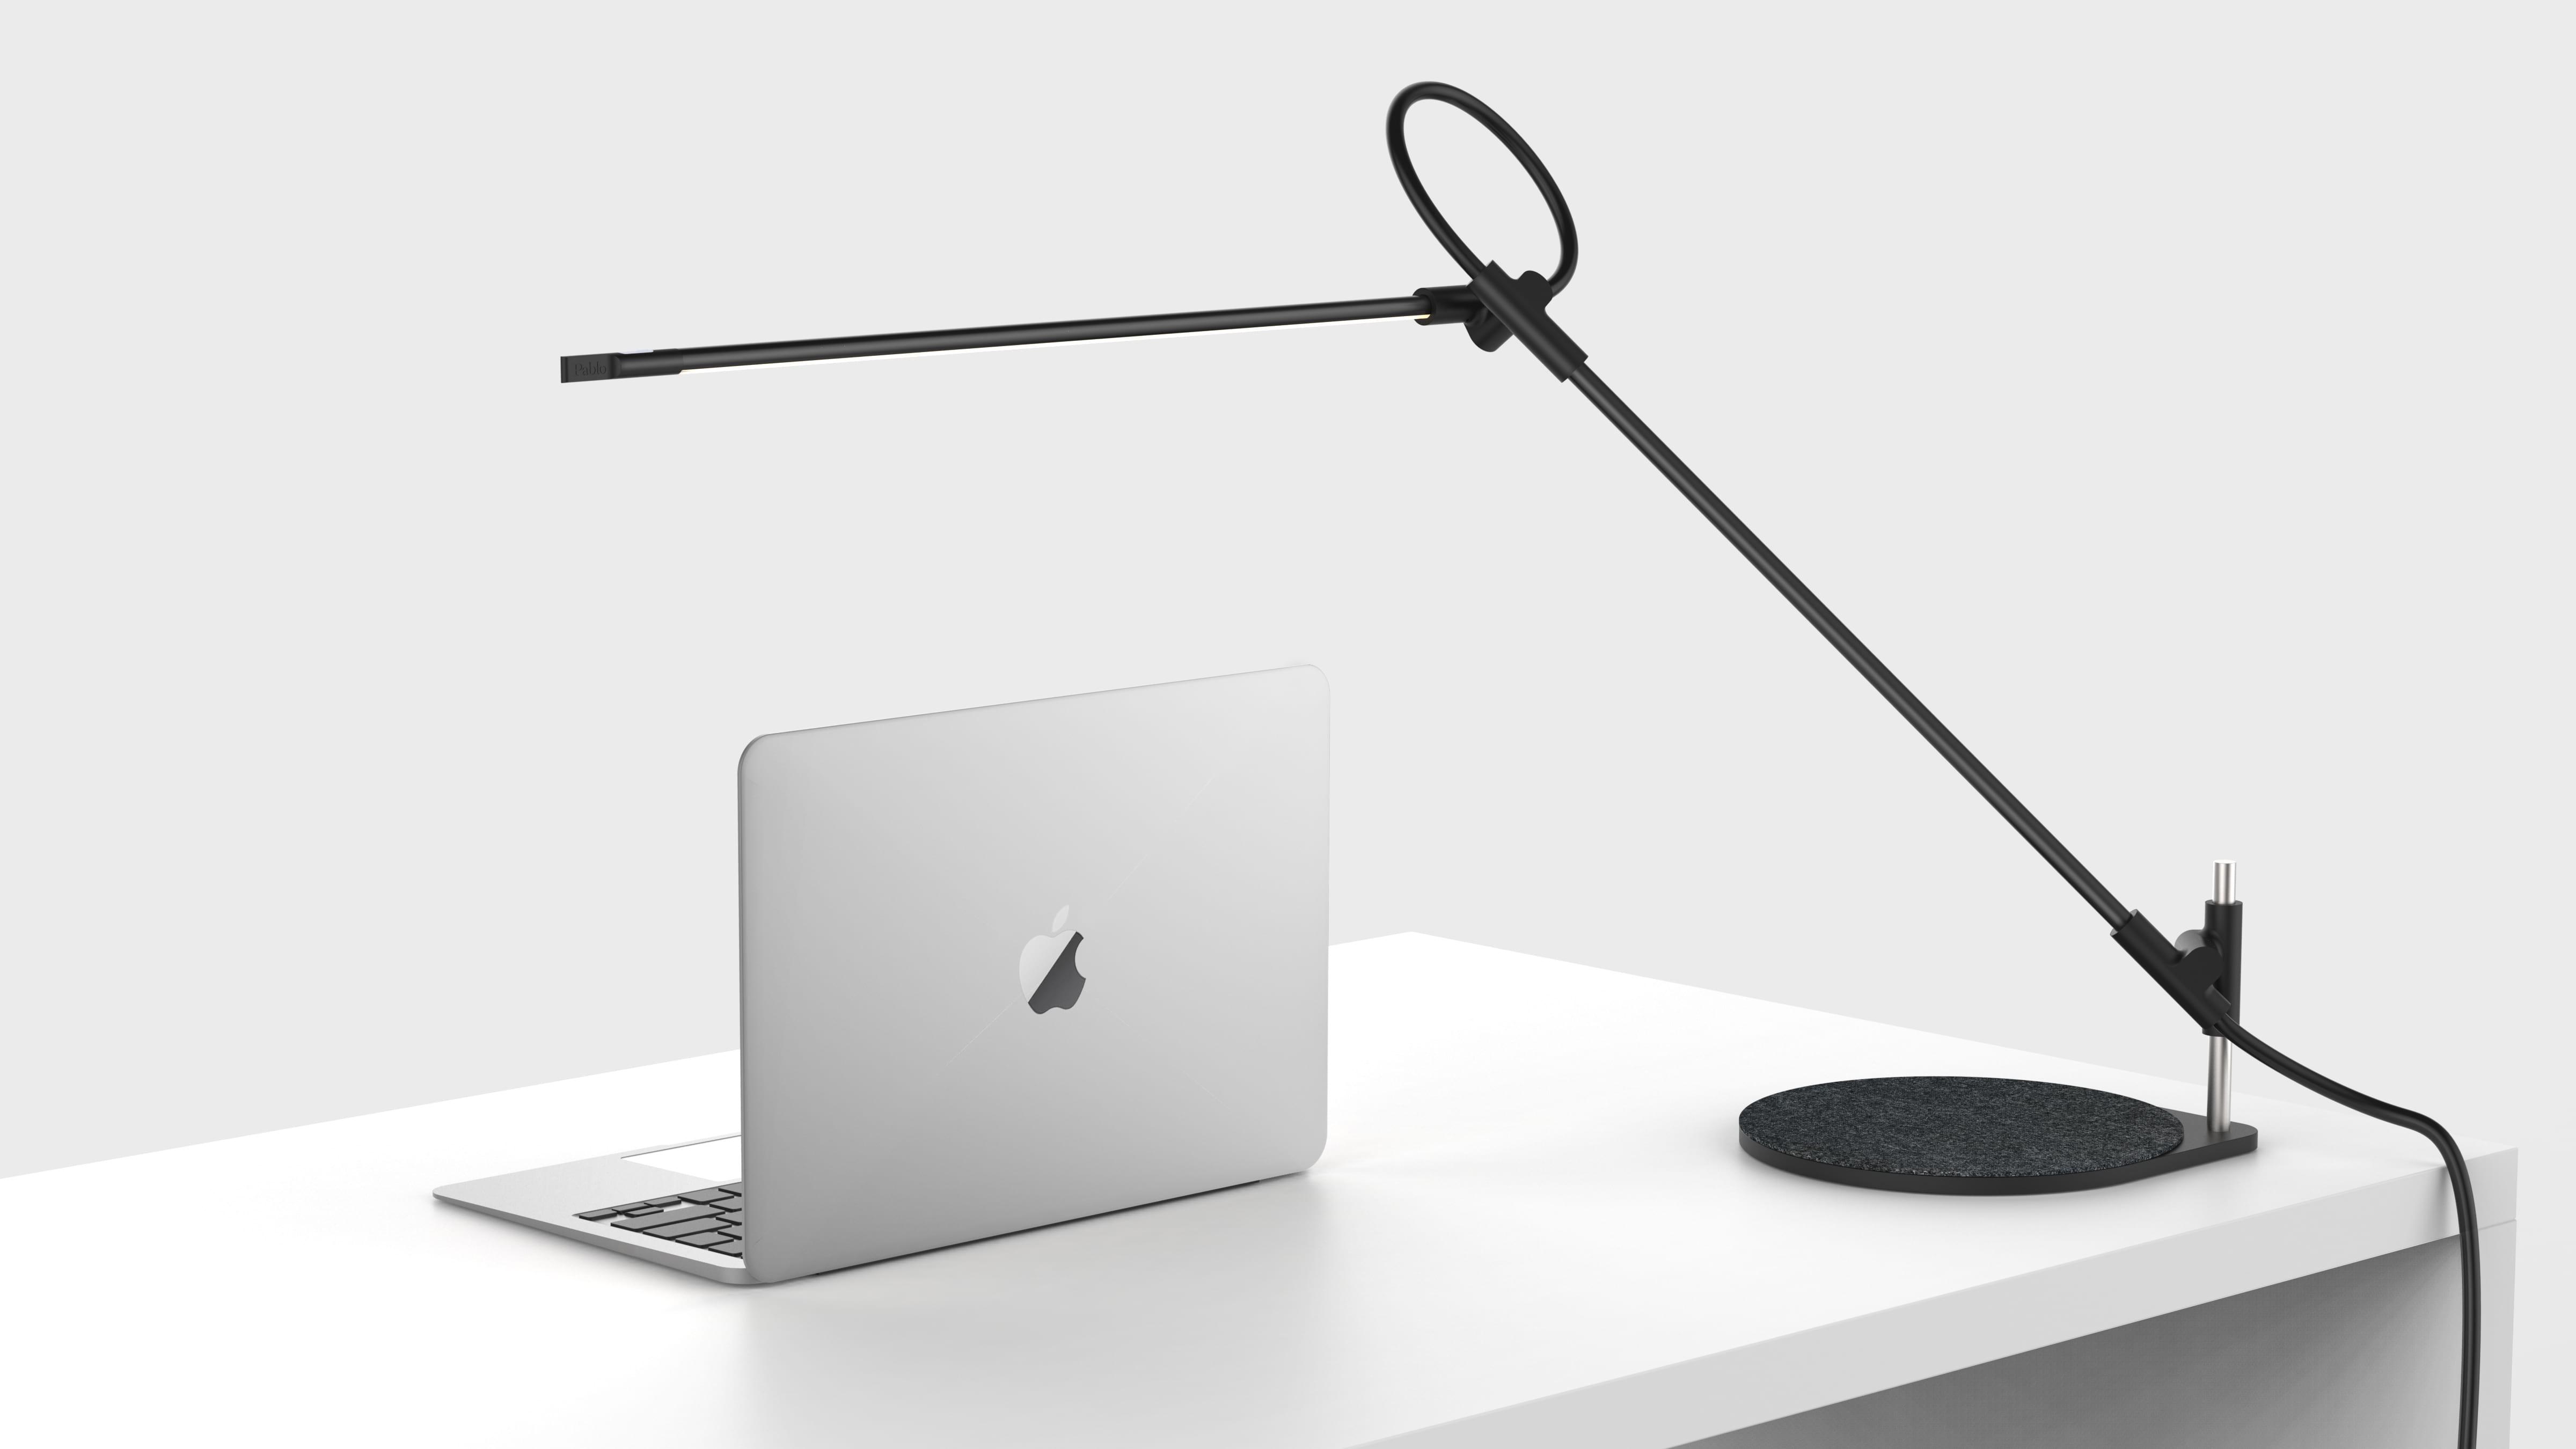 Pablo Designs Superlight Led Desk Lamp Black Design Is This